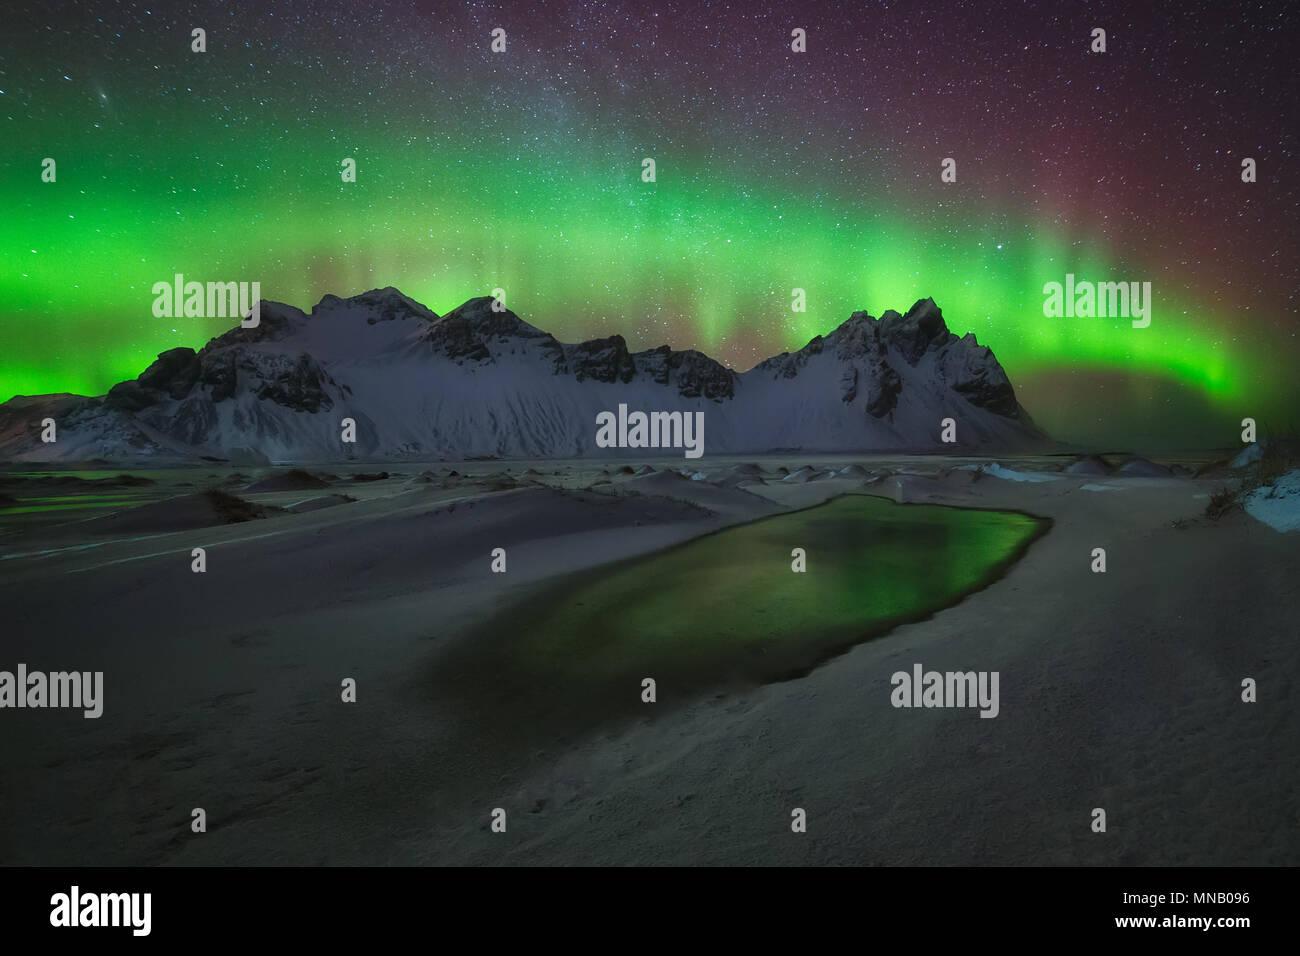 Aurora Borealis green reflection over the water at Stokksnes - Stock Image